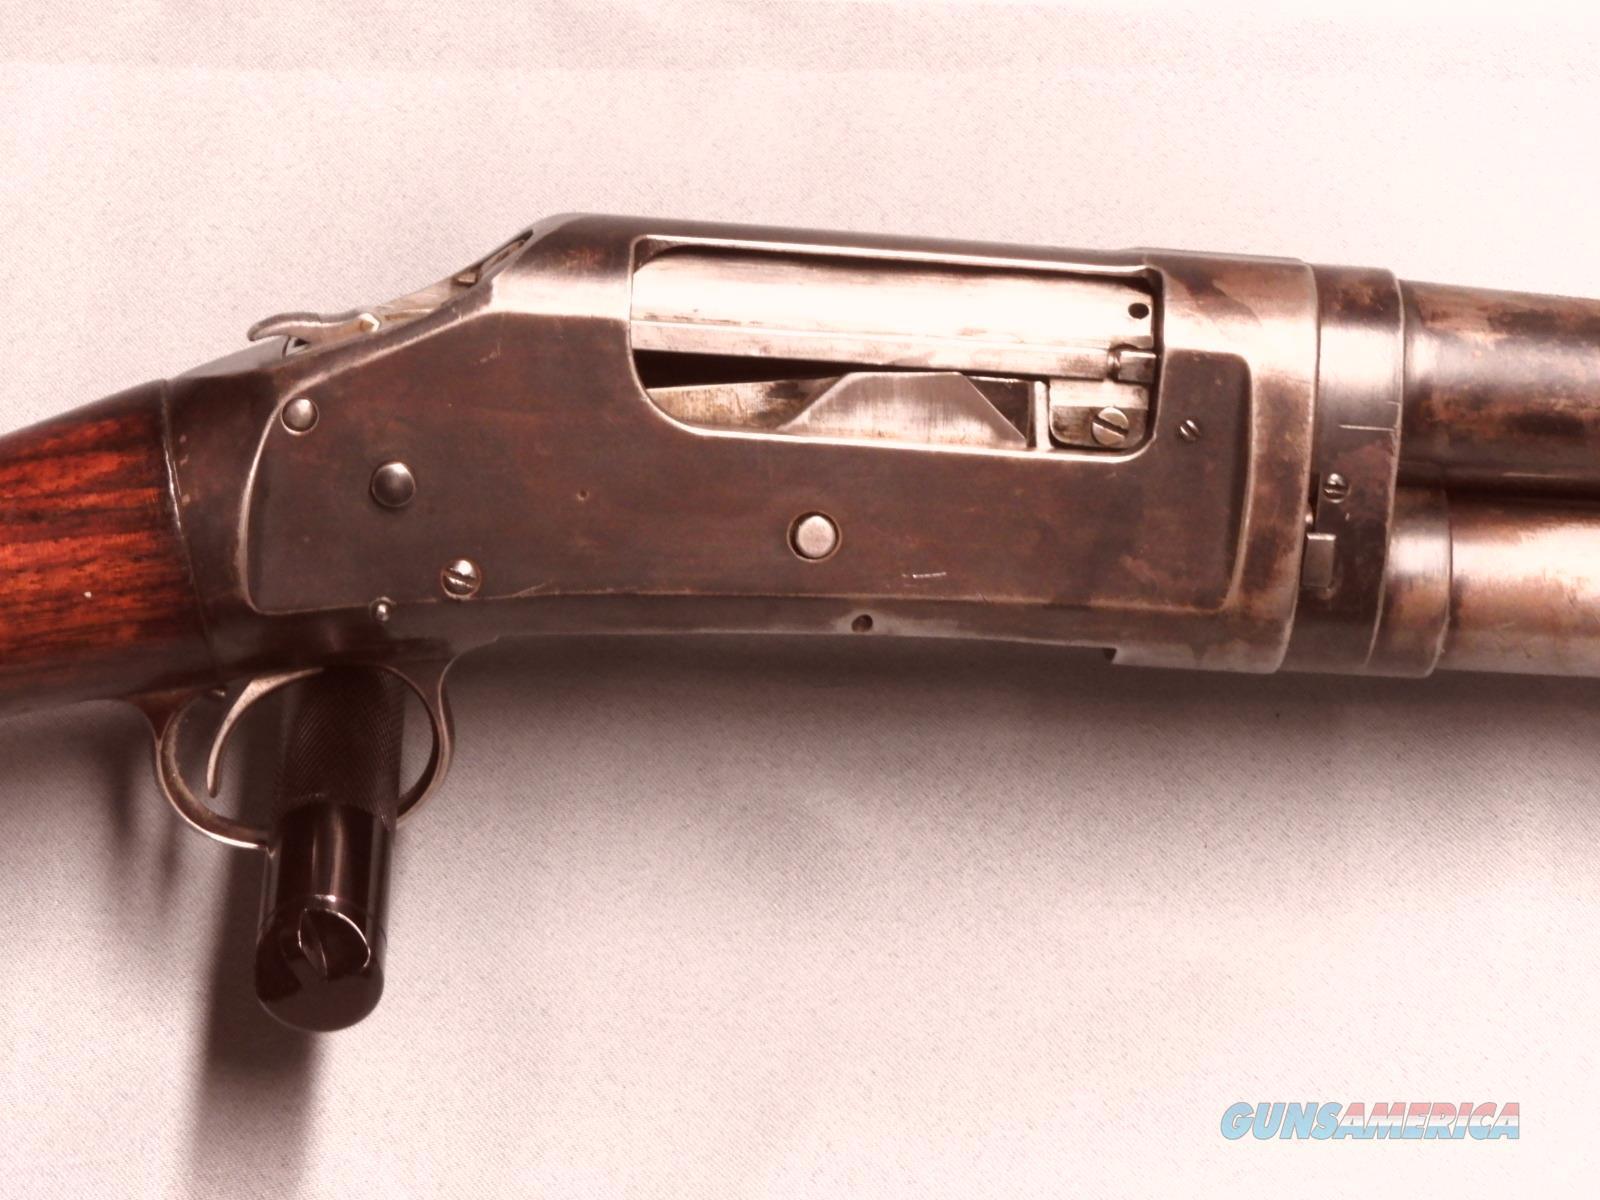 Winchester 1897  Guns > Shotguns > Winchester Shotguns - Modern > Pump Action > Hunting